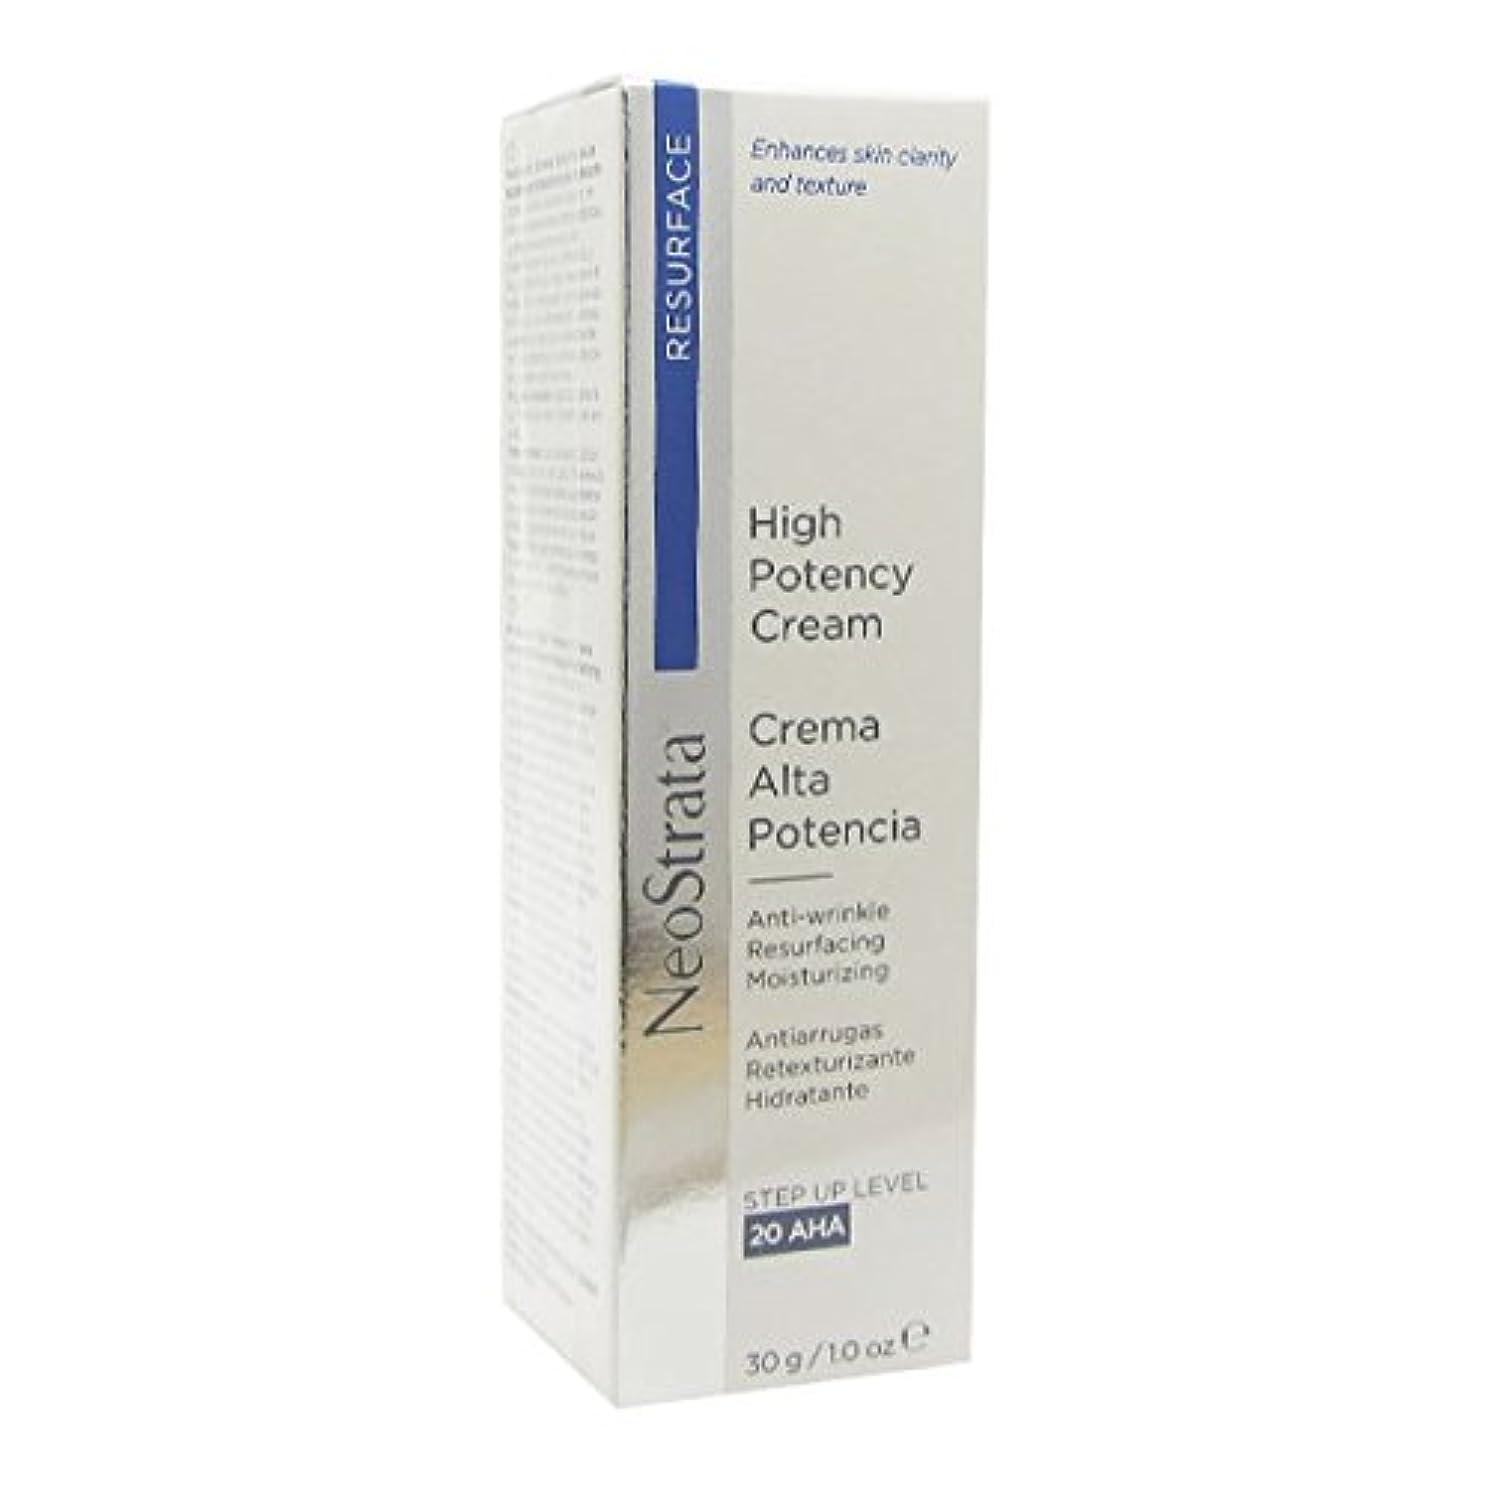 Neostrata High Potency Cream Anti-wrinkle Resurfacing Moisturizing 30g [並行輸入品]